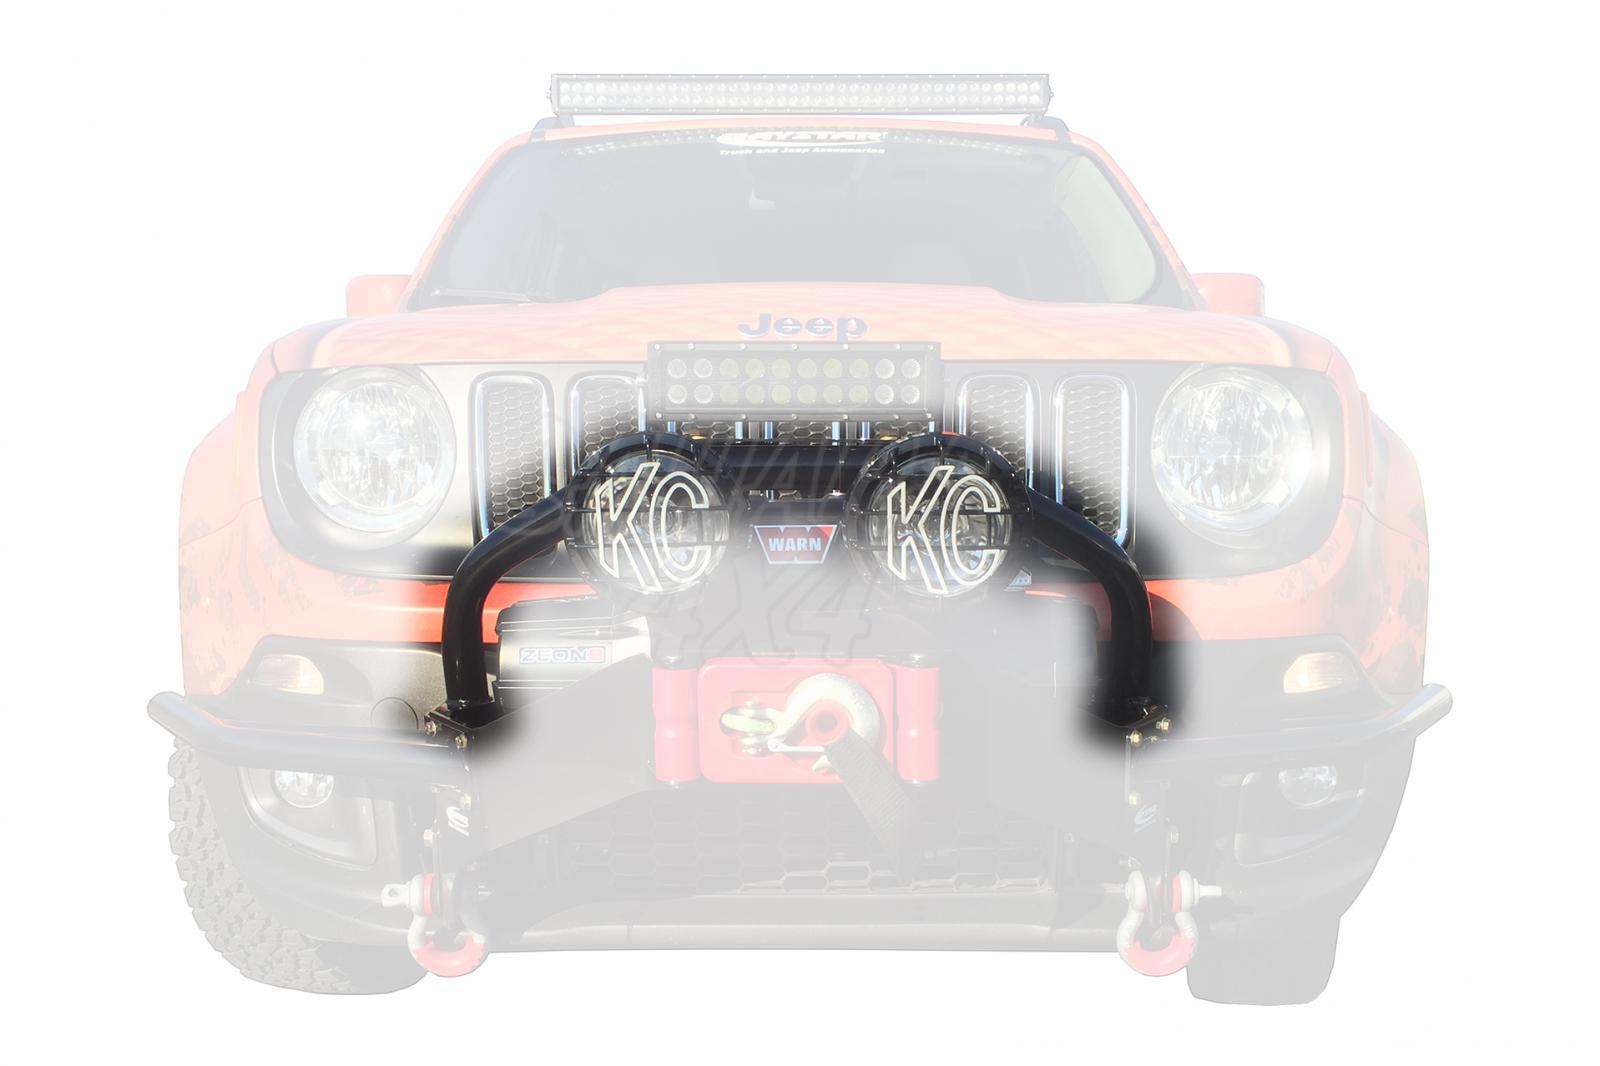 Front winch bumper light bar mount daystar jeep renegade front winch bumper light bar mount daystar jeep renegade for winch mount mozeypictures Choice Image